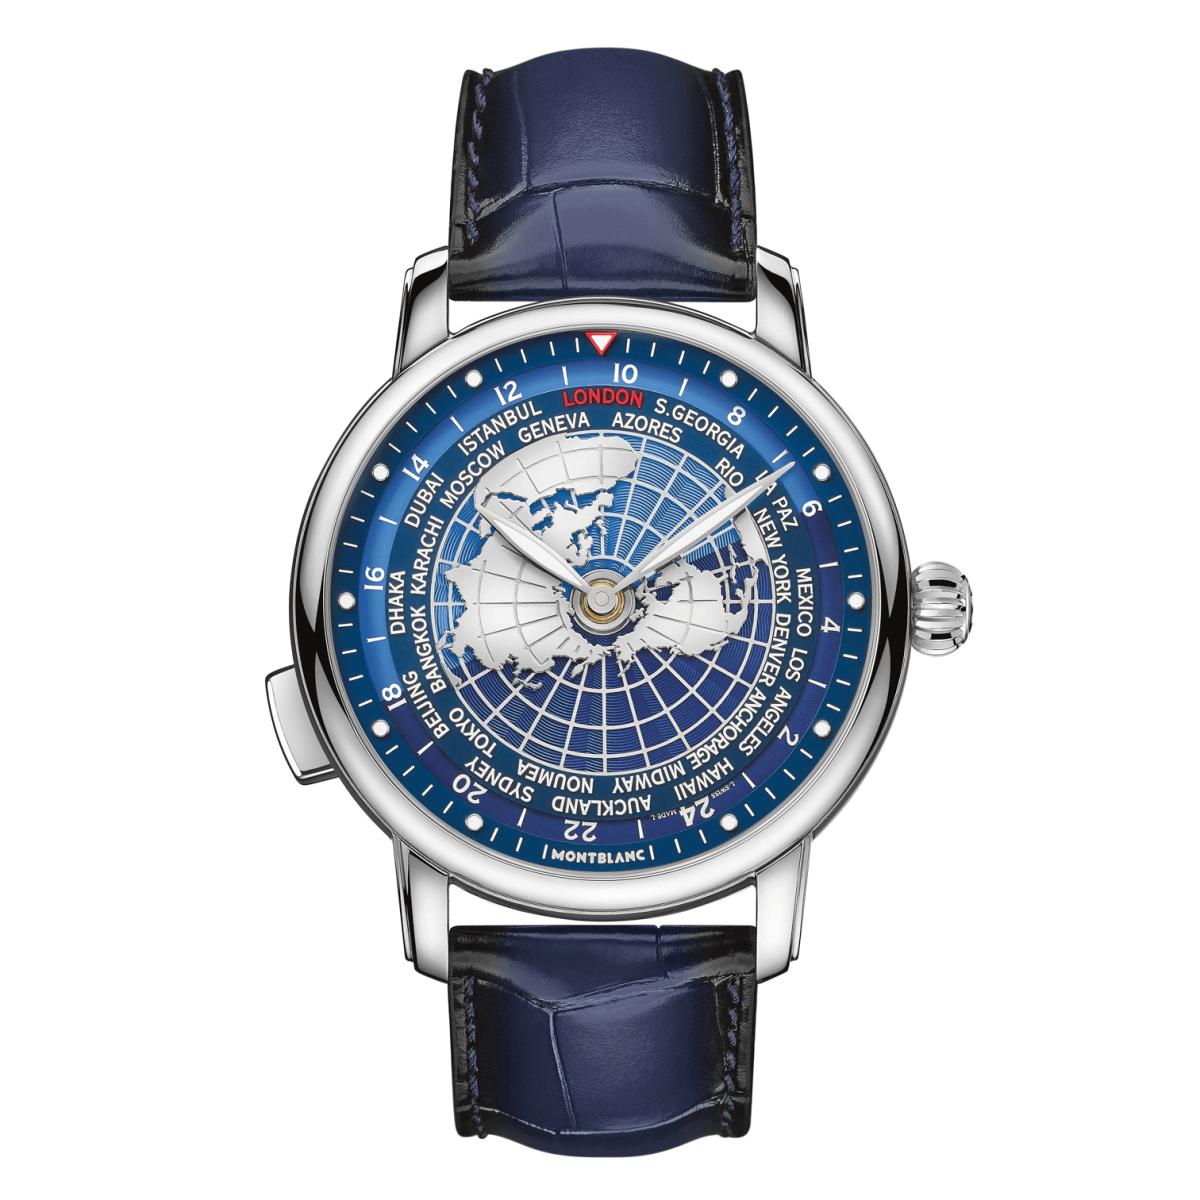 đồng hồ giờ thế giới world-time montblanc star orbis terrarum 2020